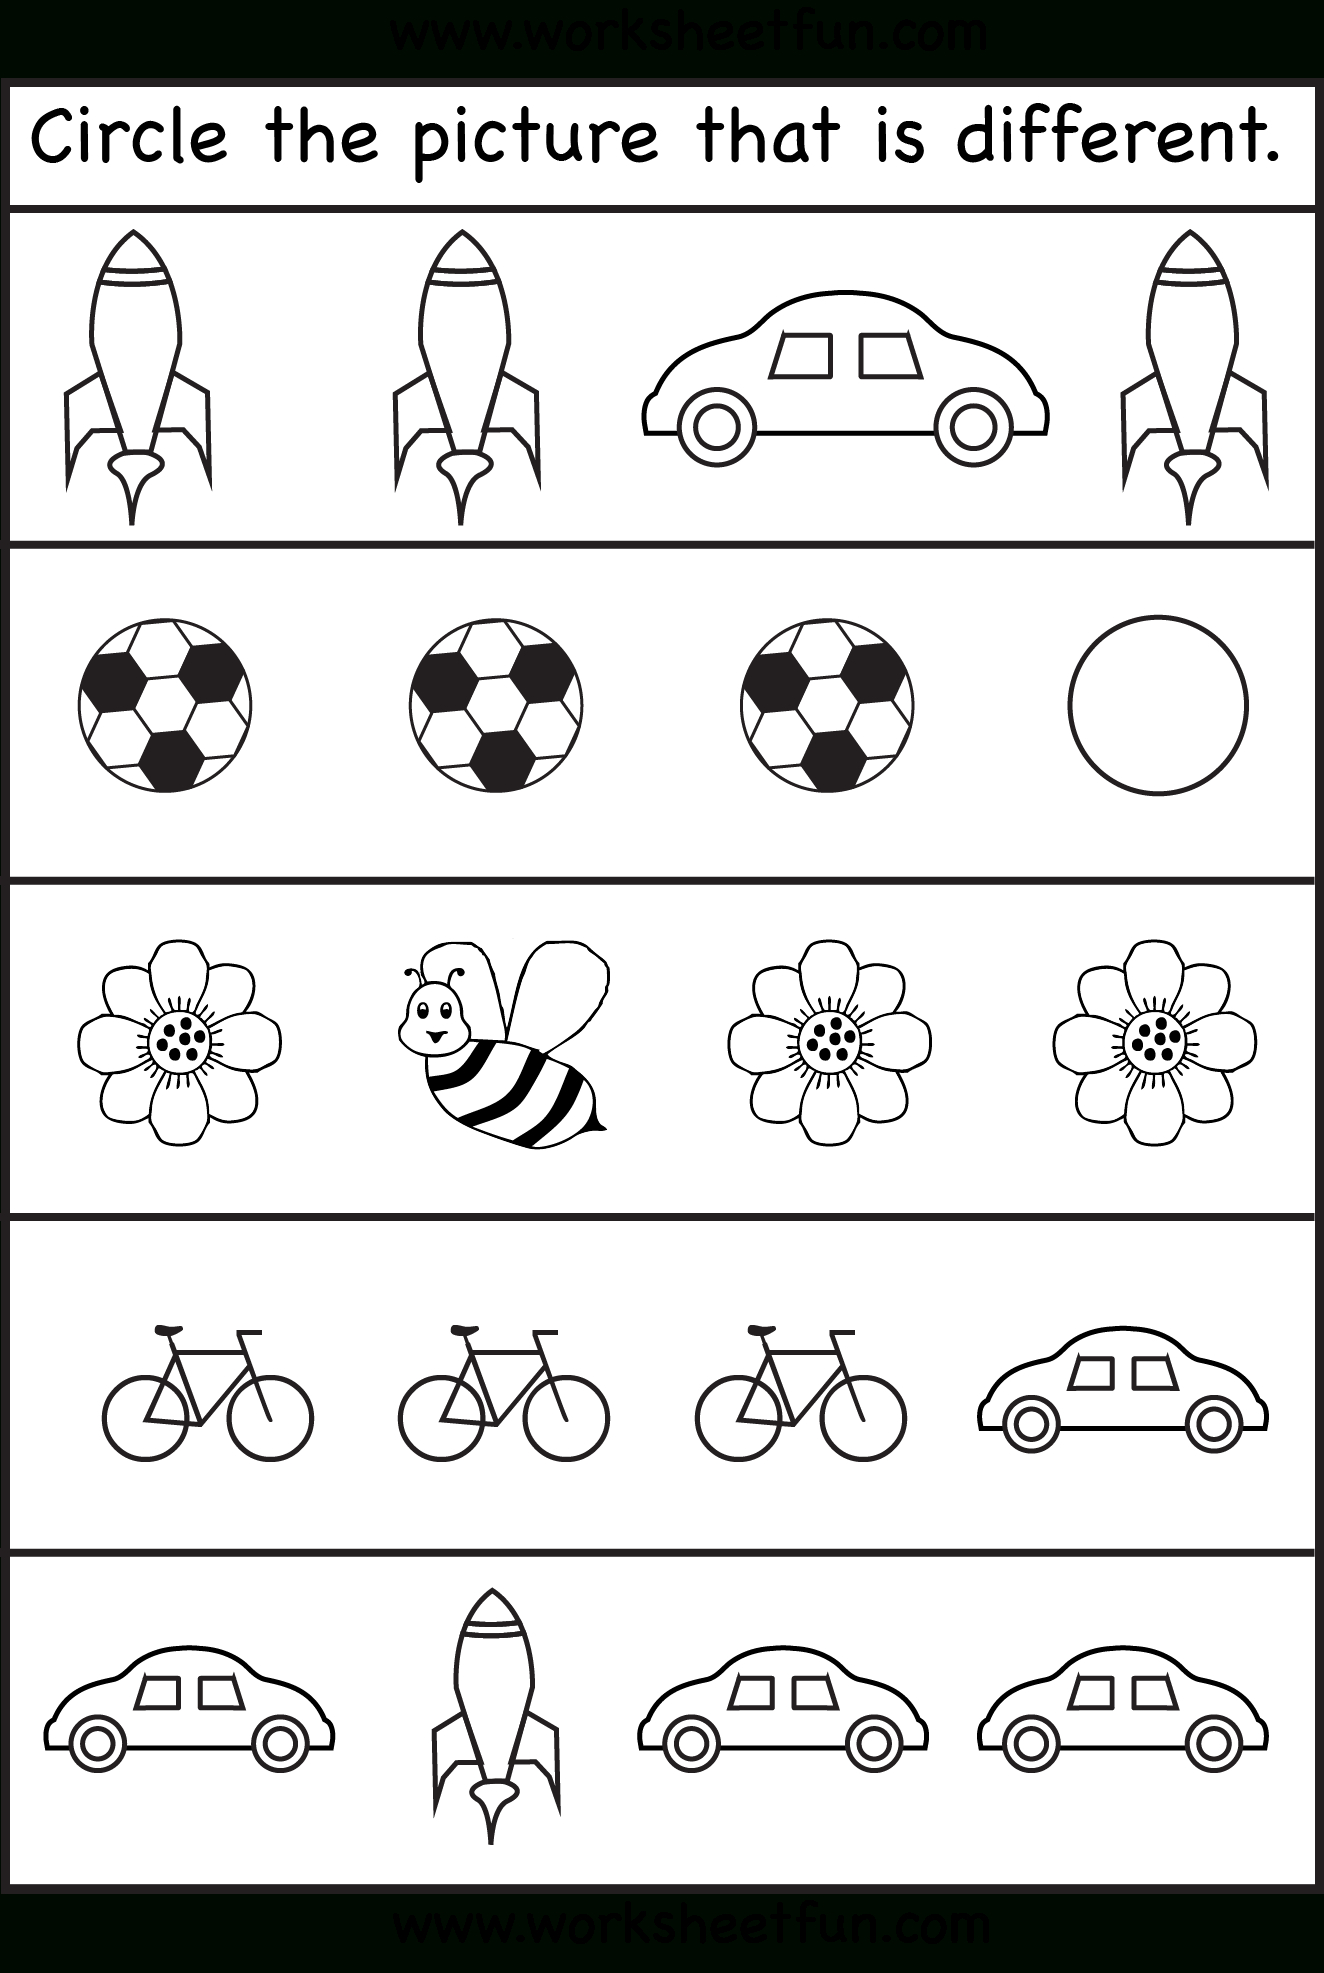 Same Or Different Worksheets For Toddler | Print | Kindergarten - Free Printable Worksheets For 3 Year Olds